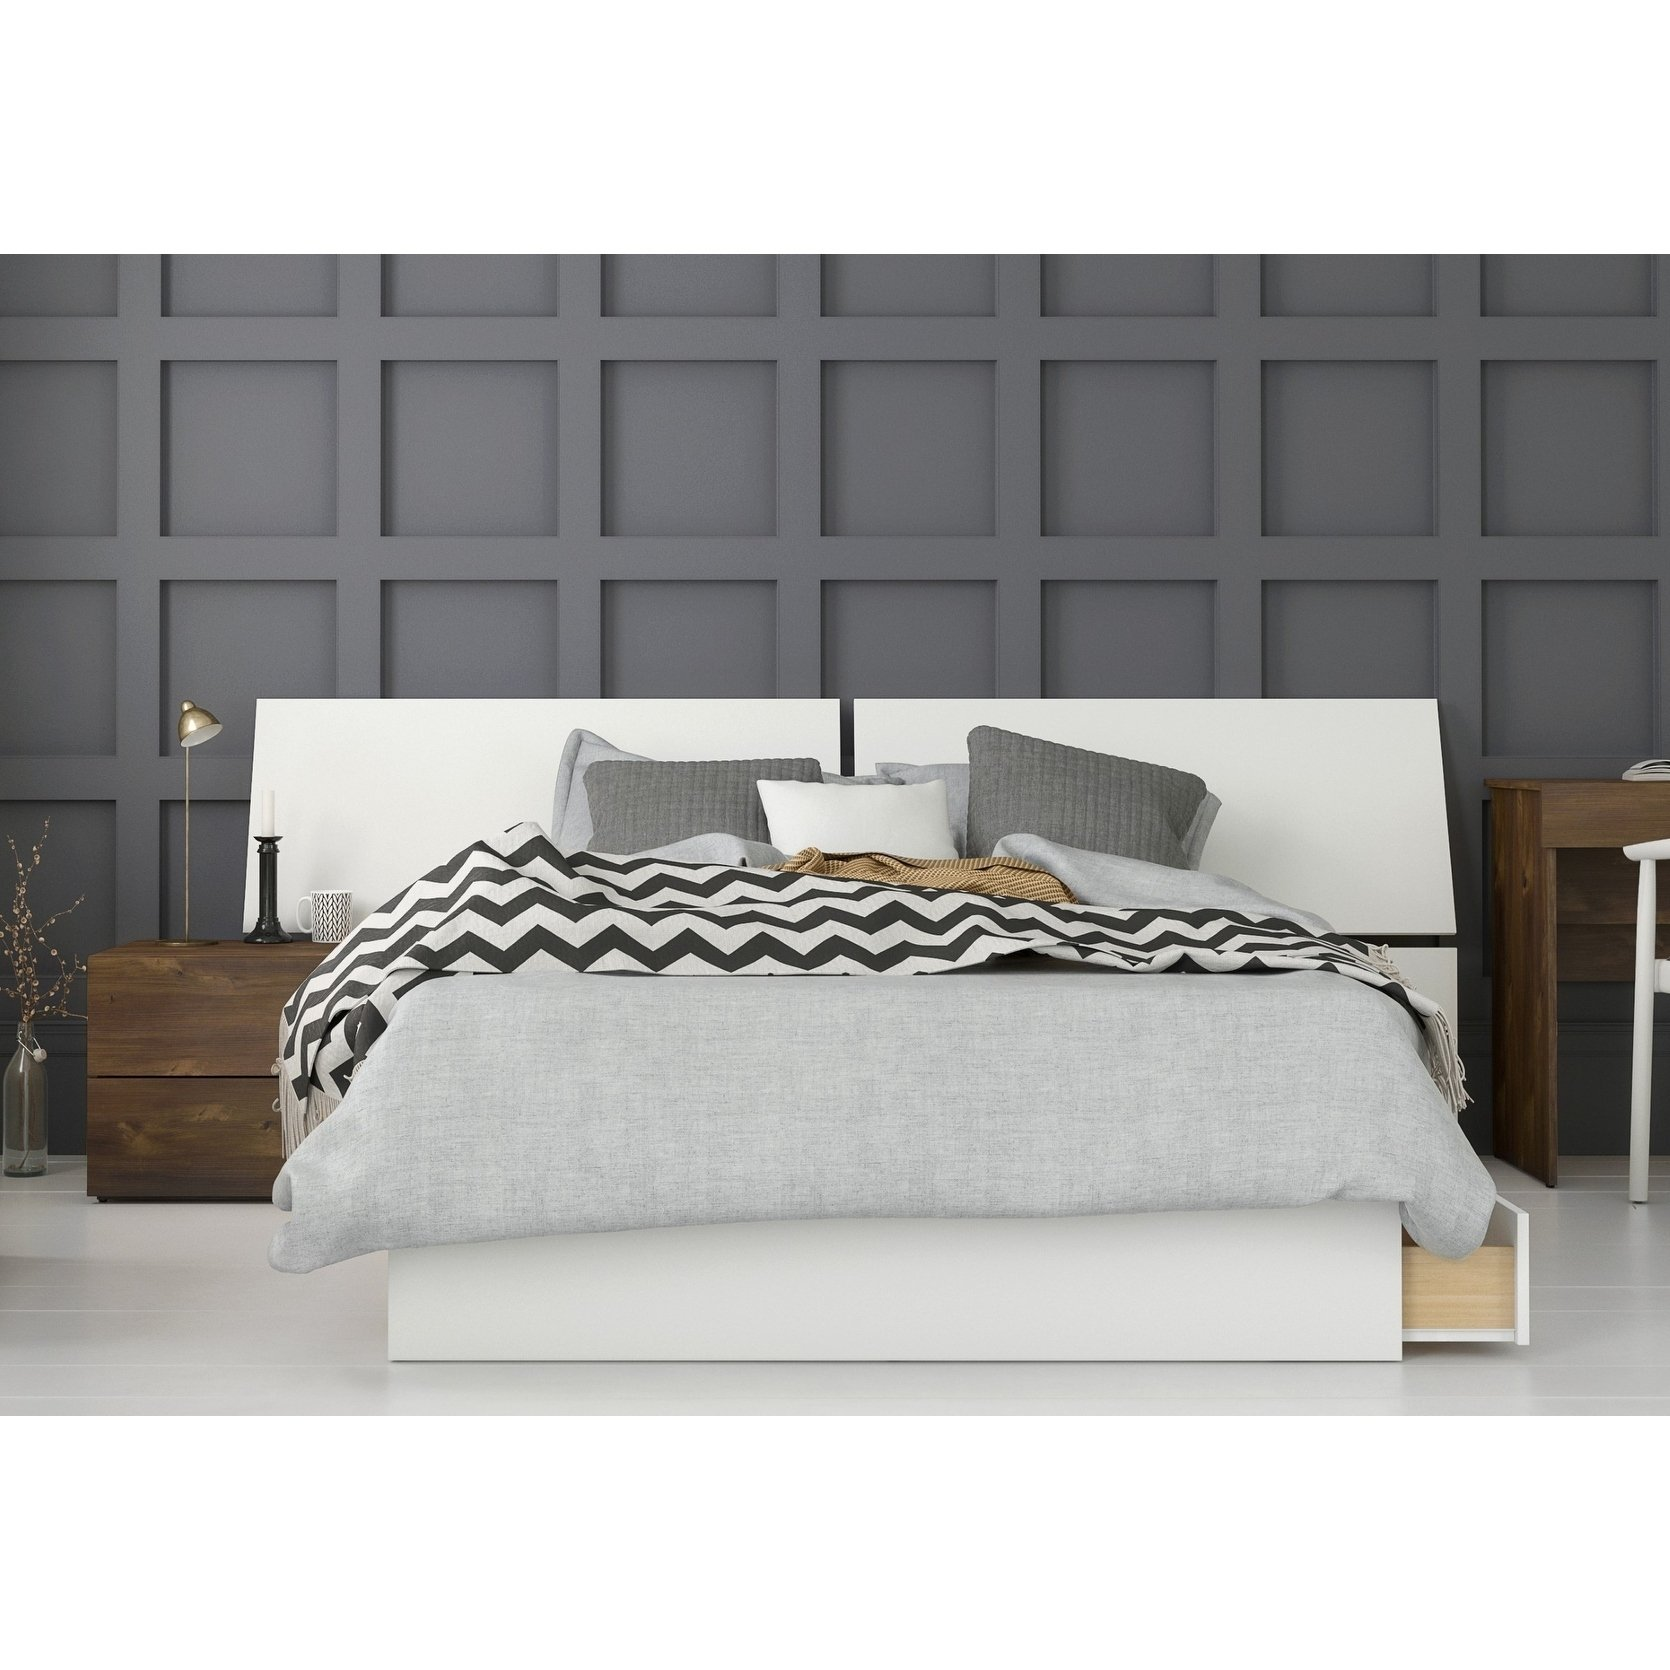 Arcadia 3 Piece Bedroom Set, Truffle & White (Full ...